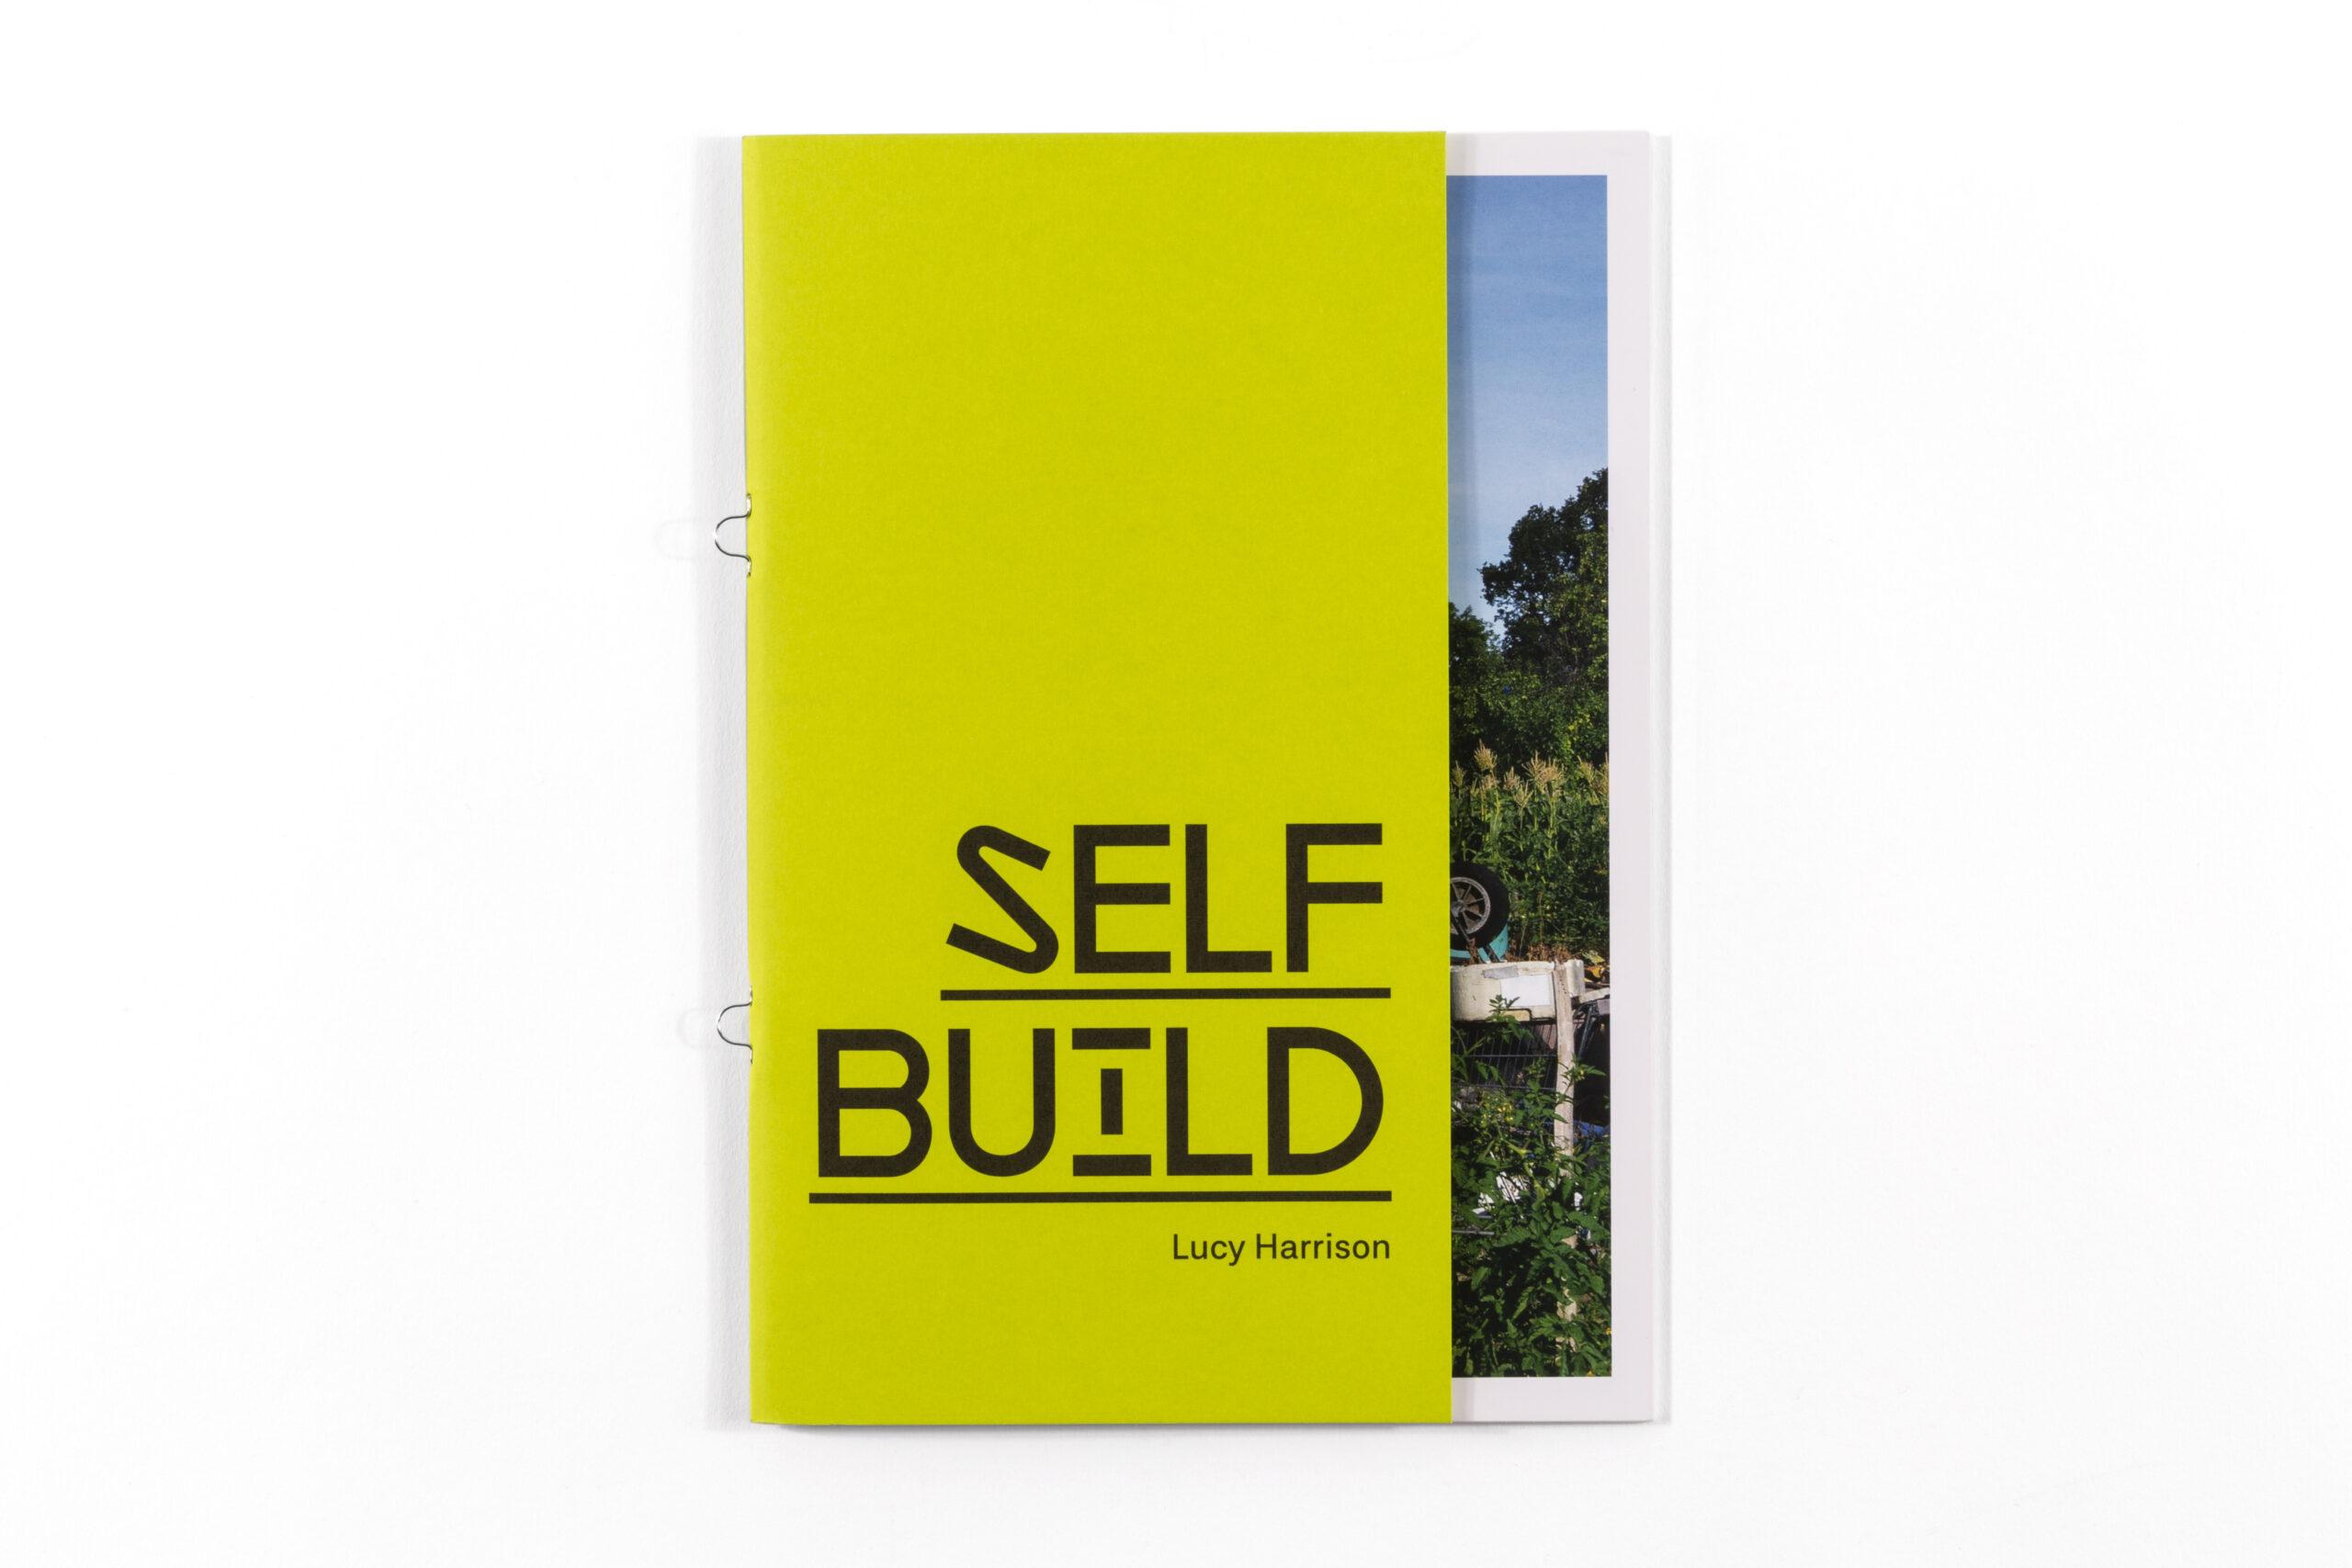 self build book